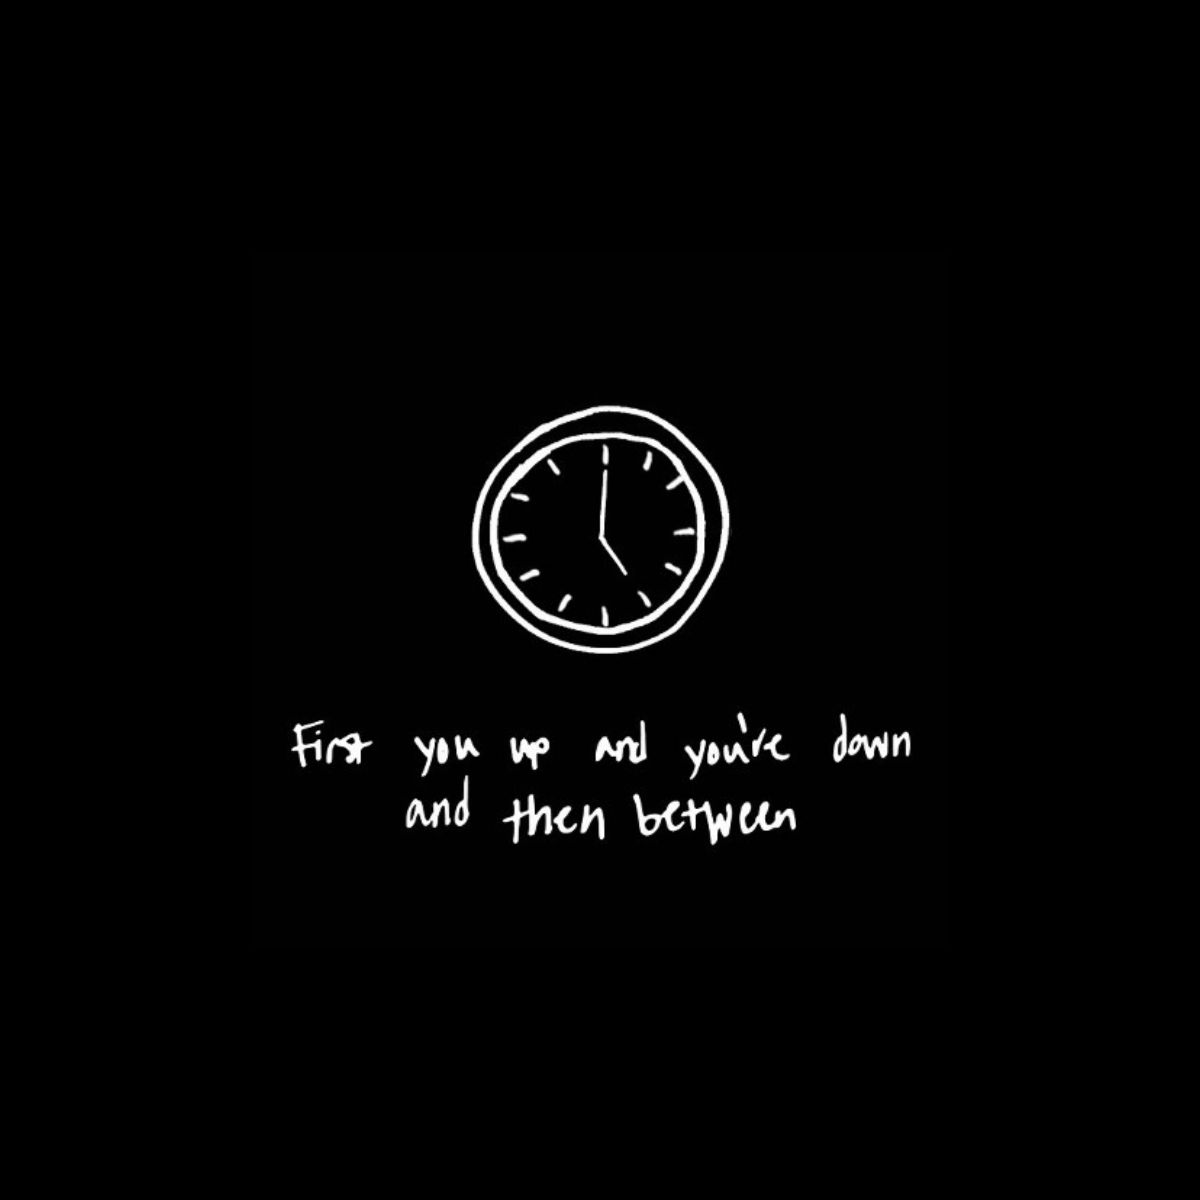 Justin bieber tumblr lyrics live quotes - Justin Bieber What Do You Mean